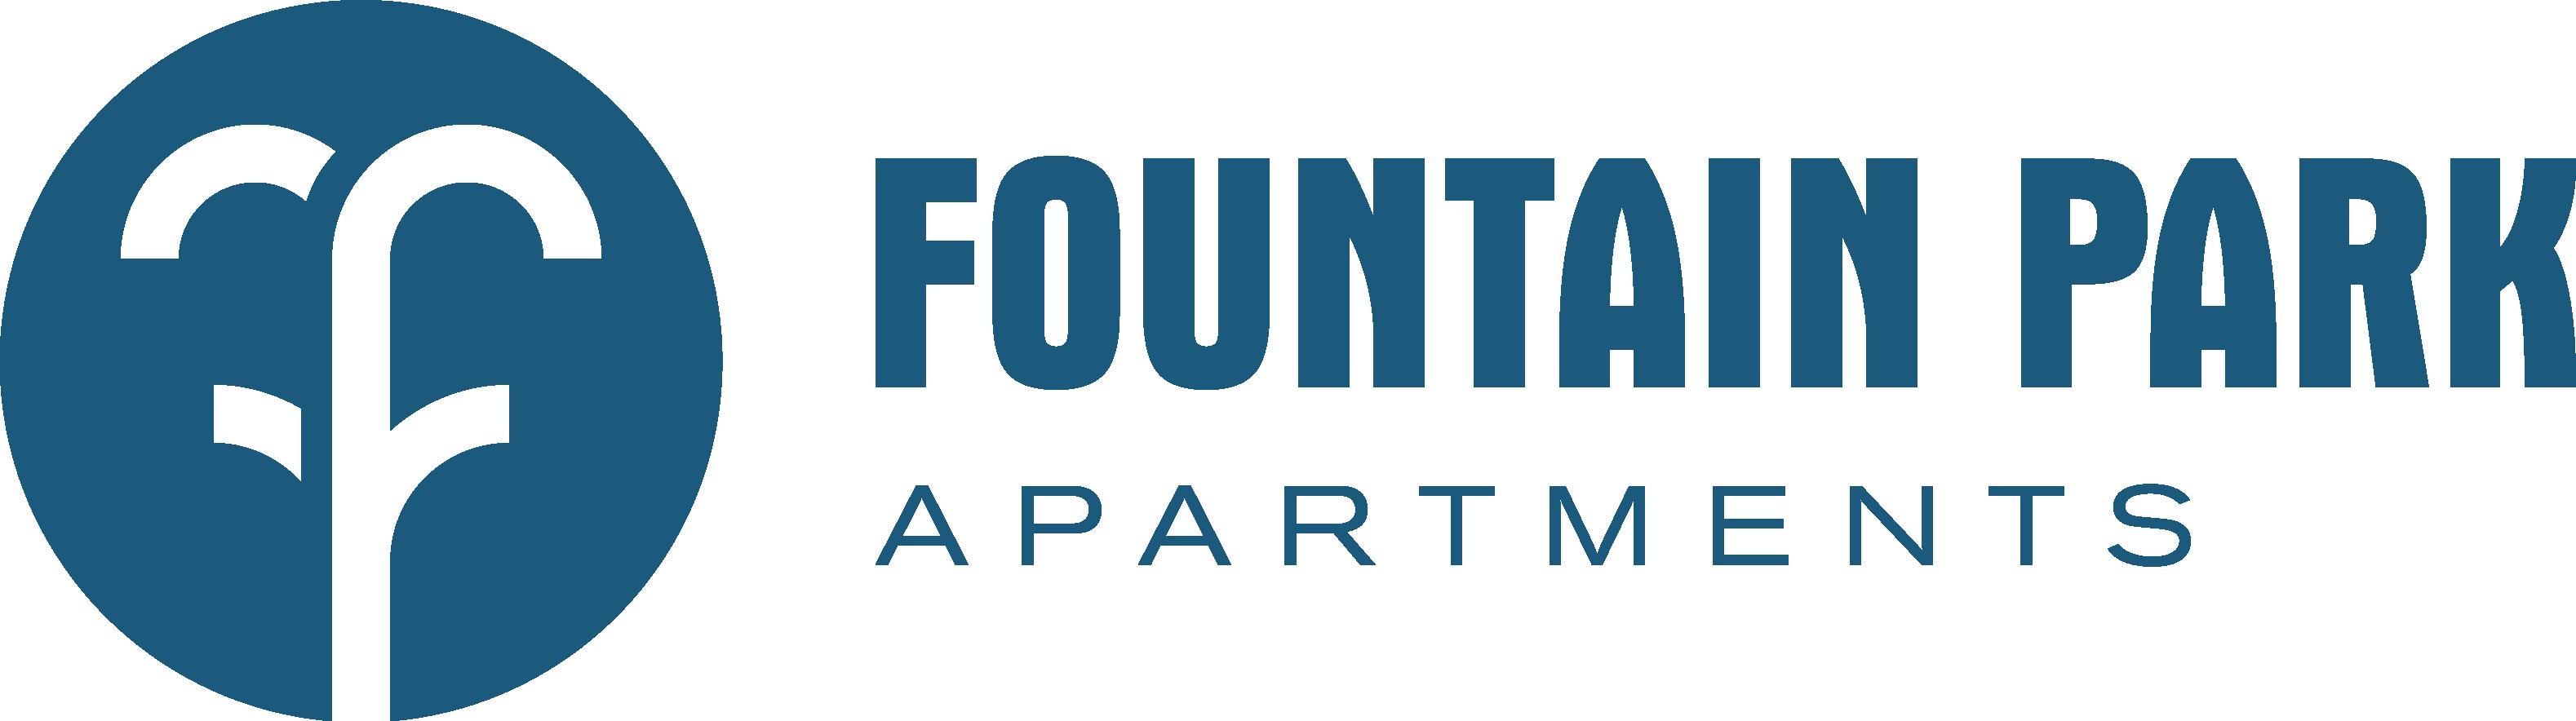 Regency - Fountain Park Apartments - Branding